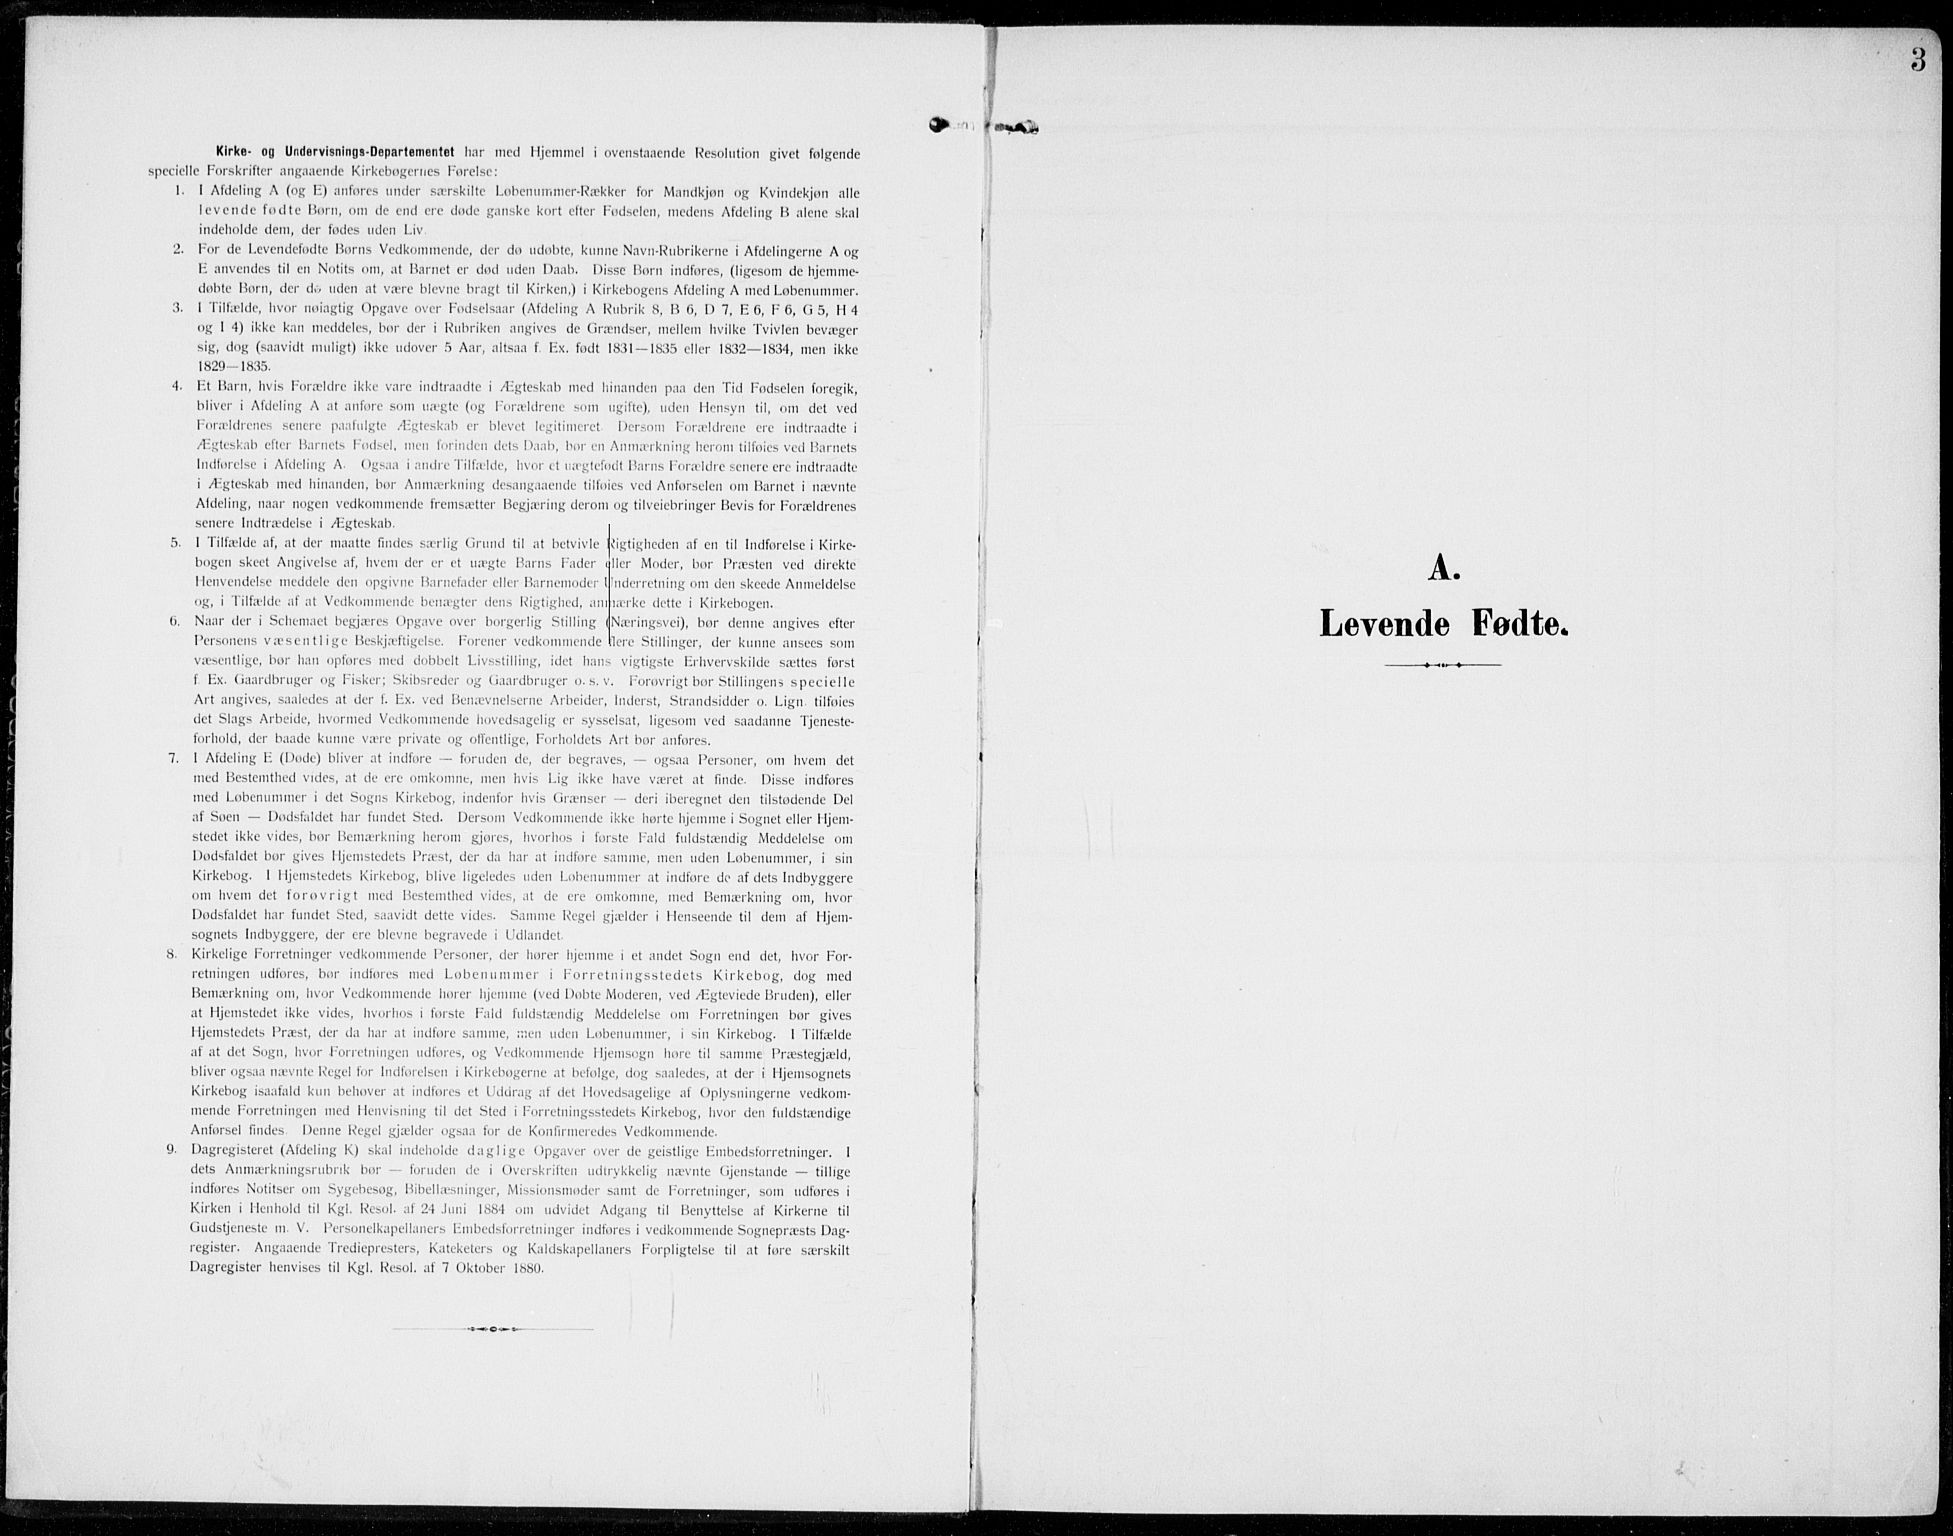 SAH, Sel prestekontor, Ministerialbok nr. 1, 1905-1922, s. 3